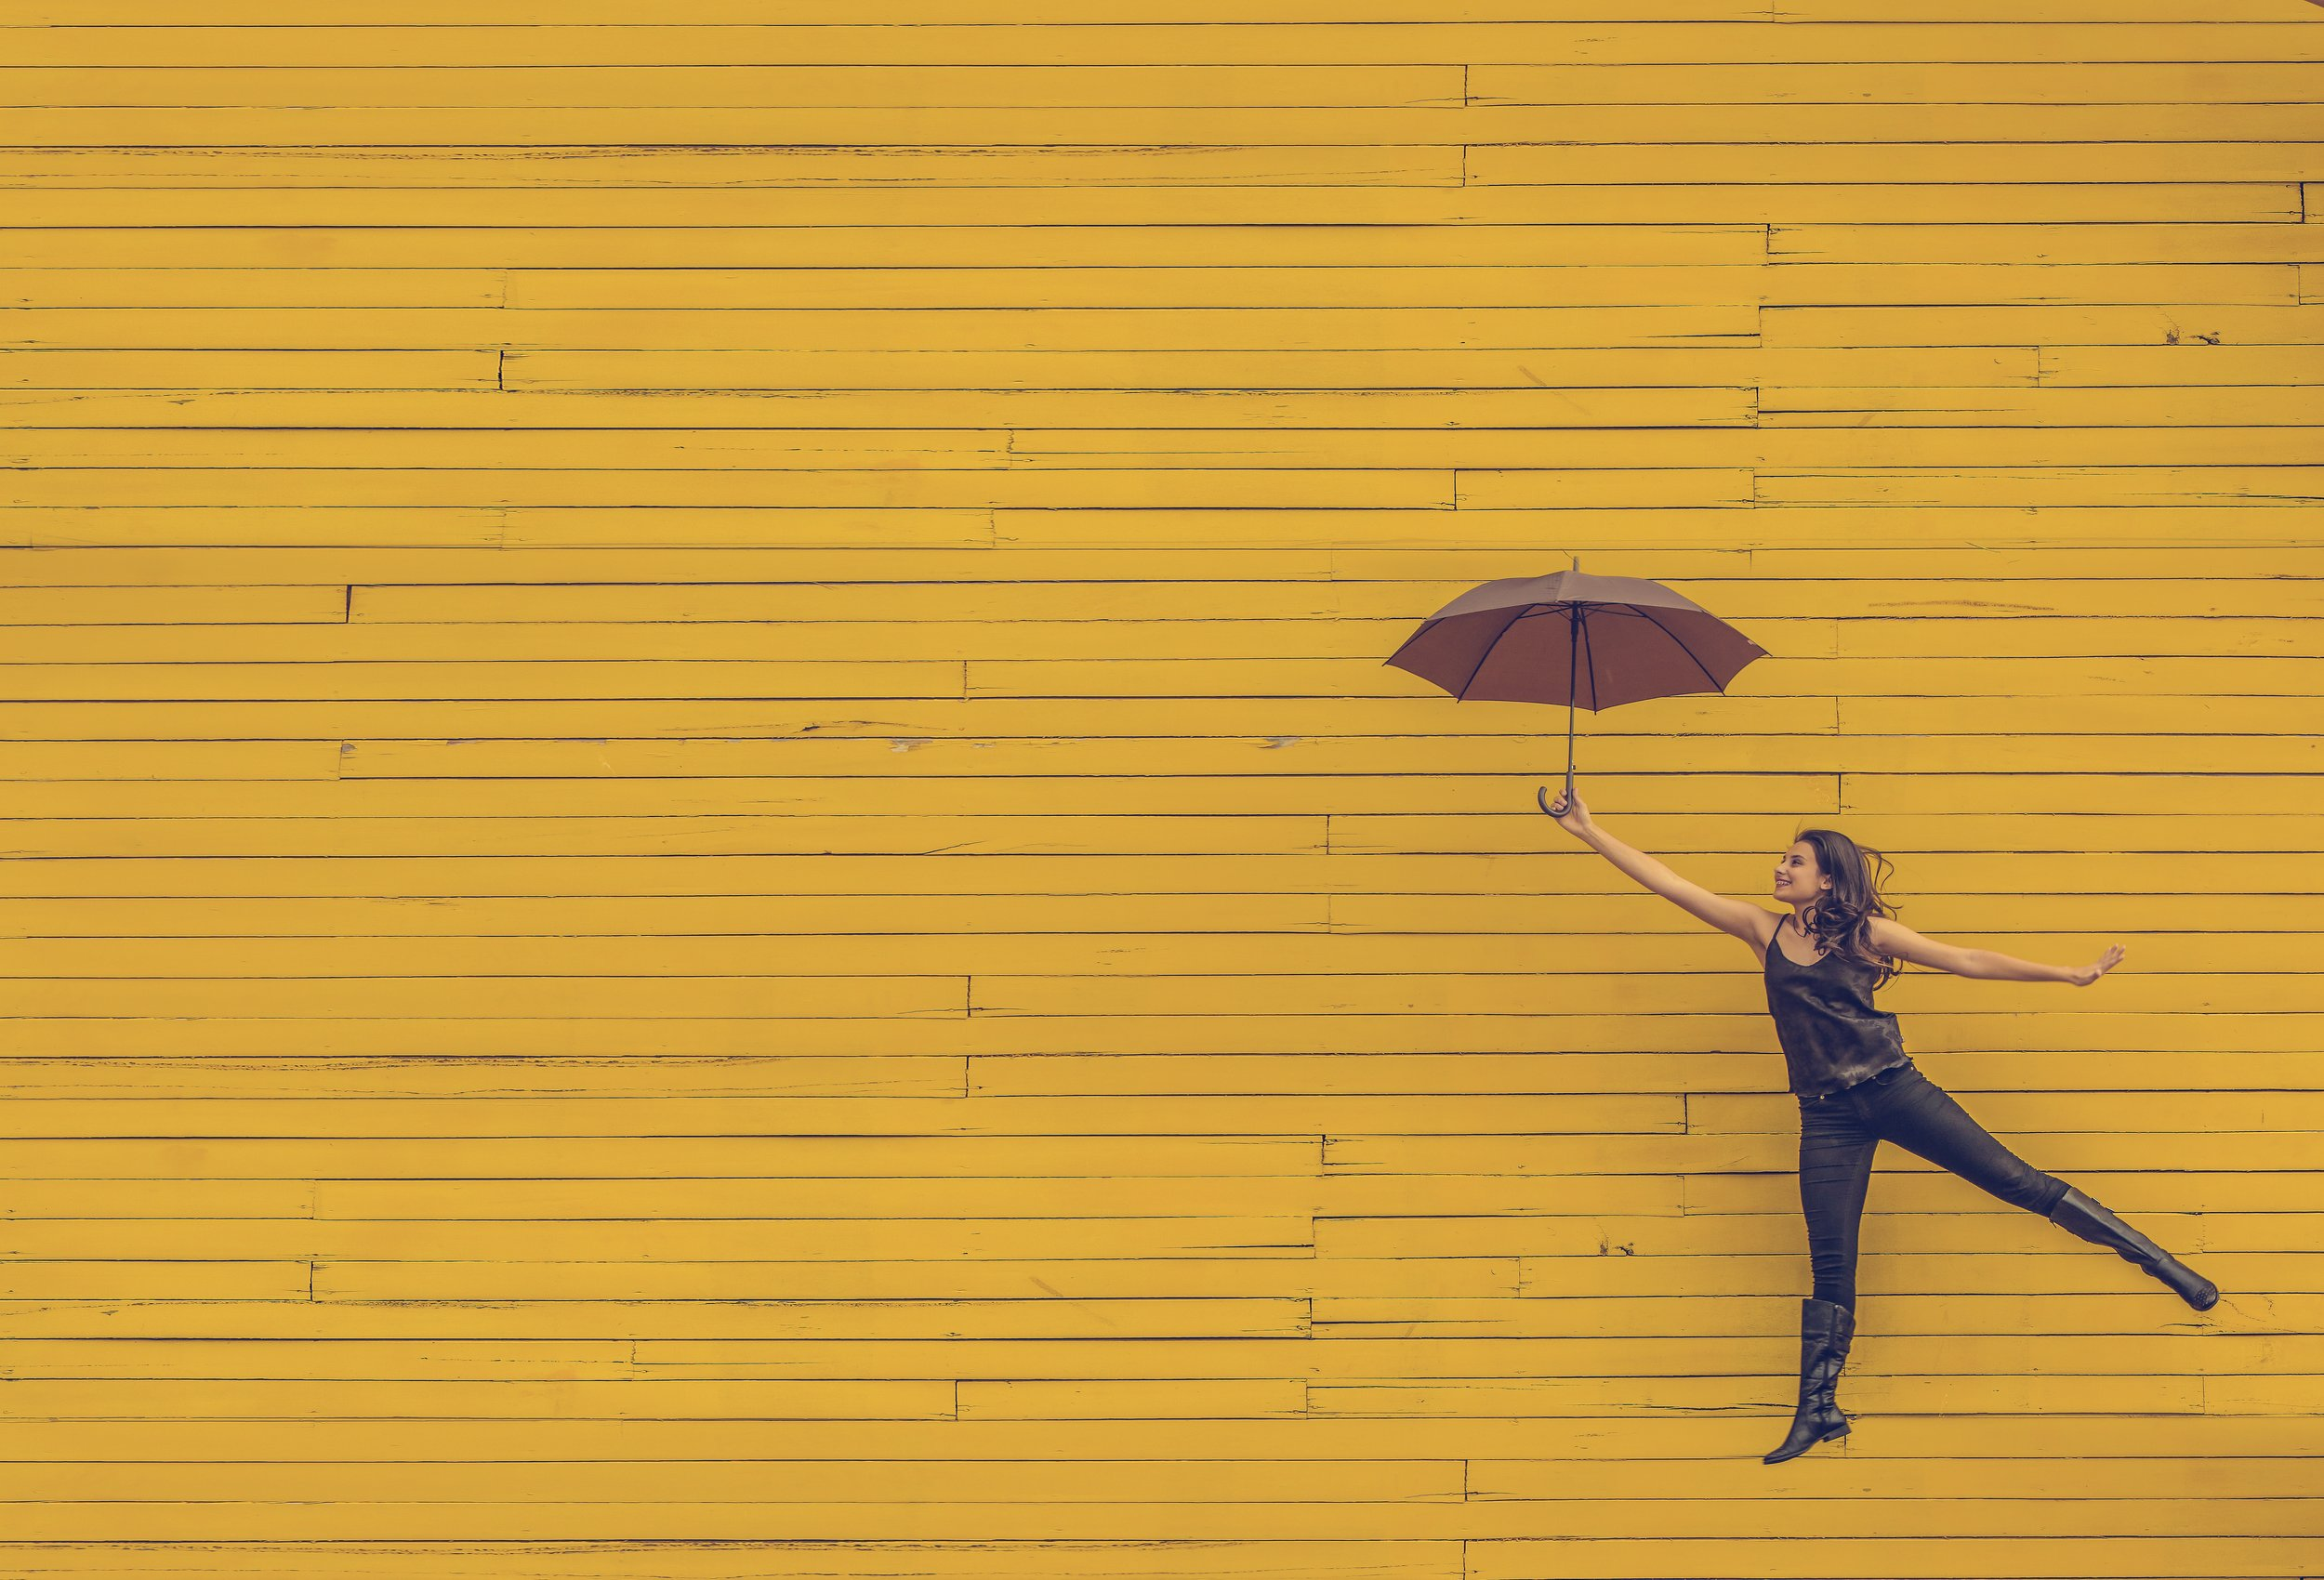 woman floating with umbrella-unsplash.jpg